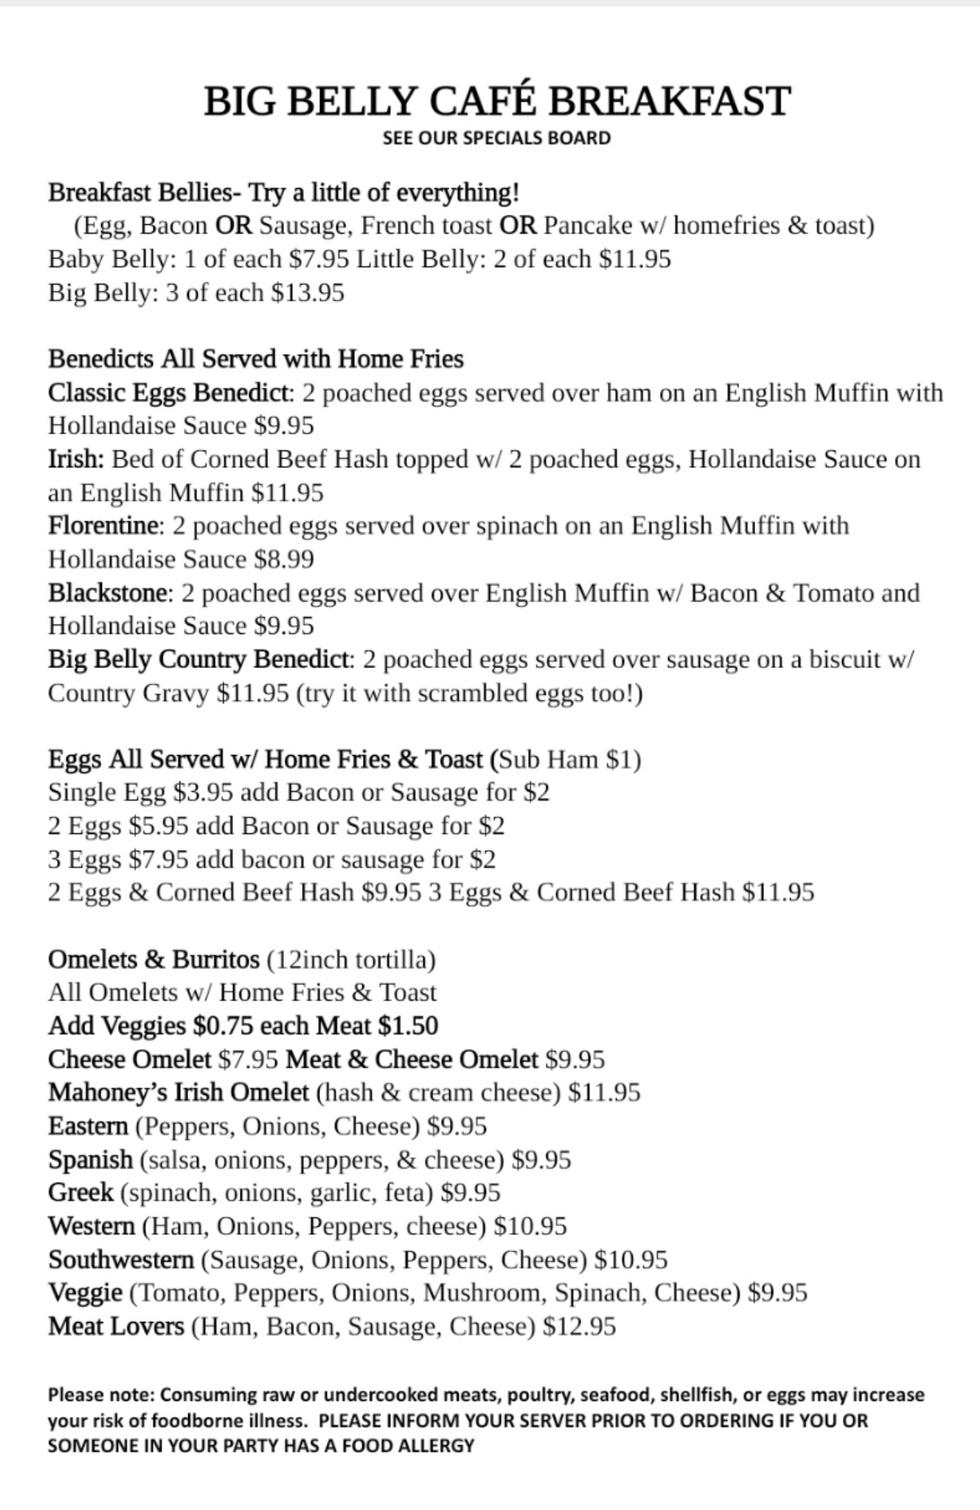 fall 2021 bfast menu.png